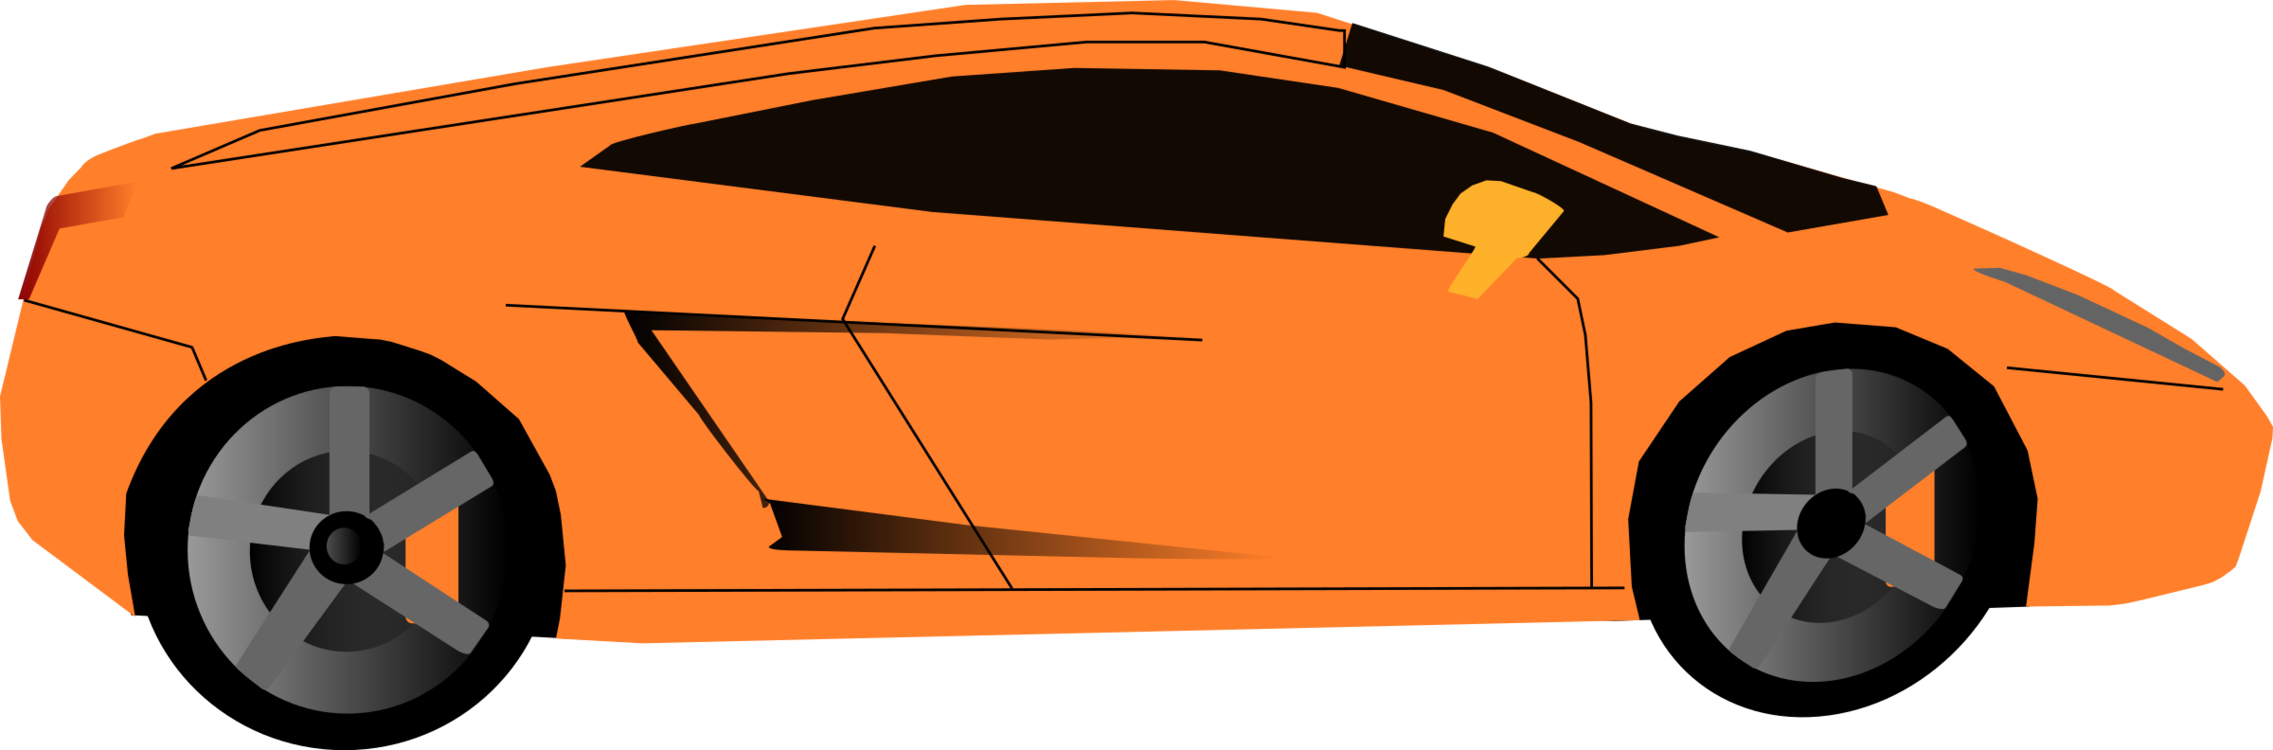 Wheel,Lamborghini,Compact Car